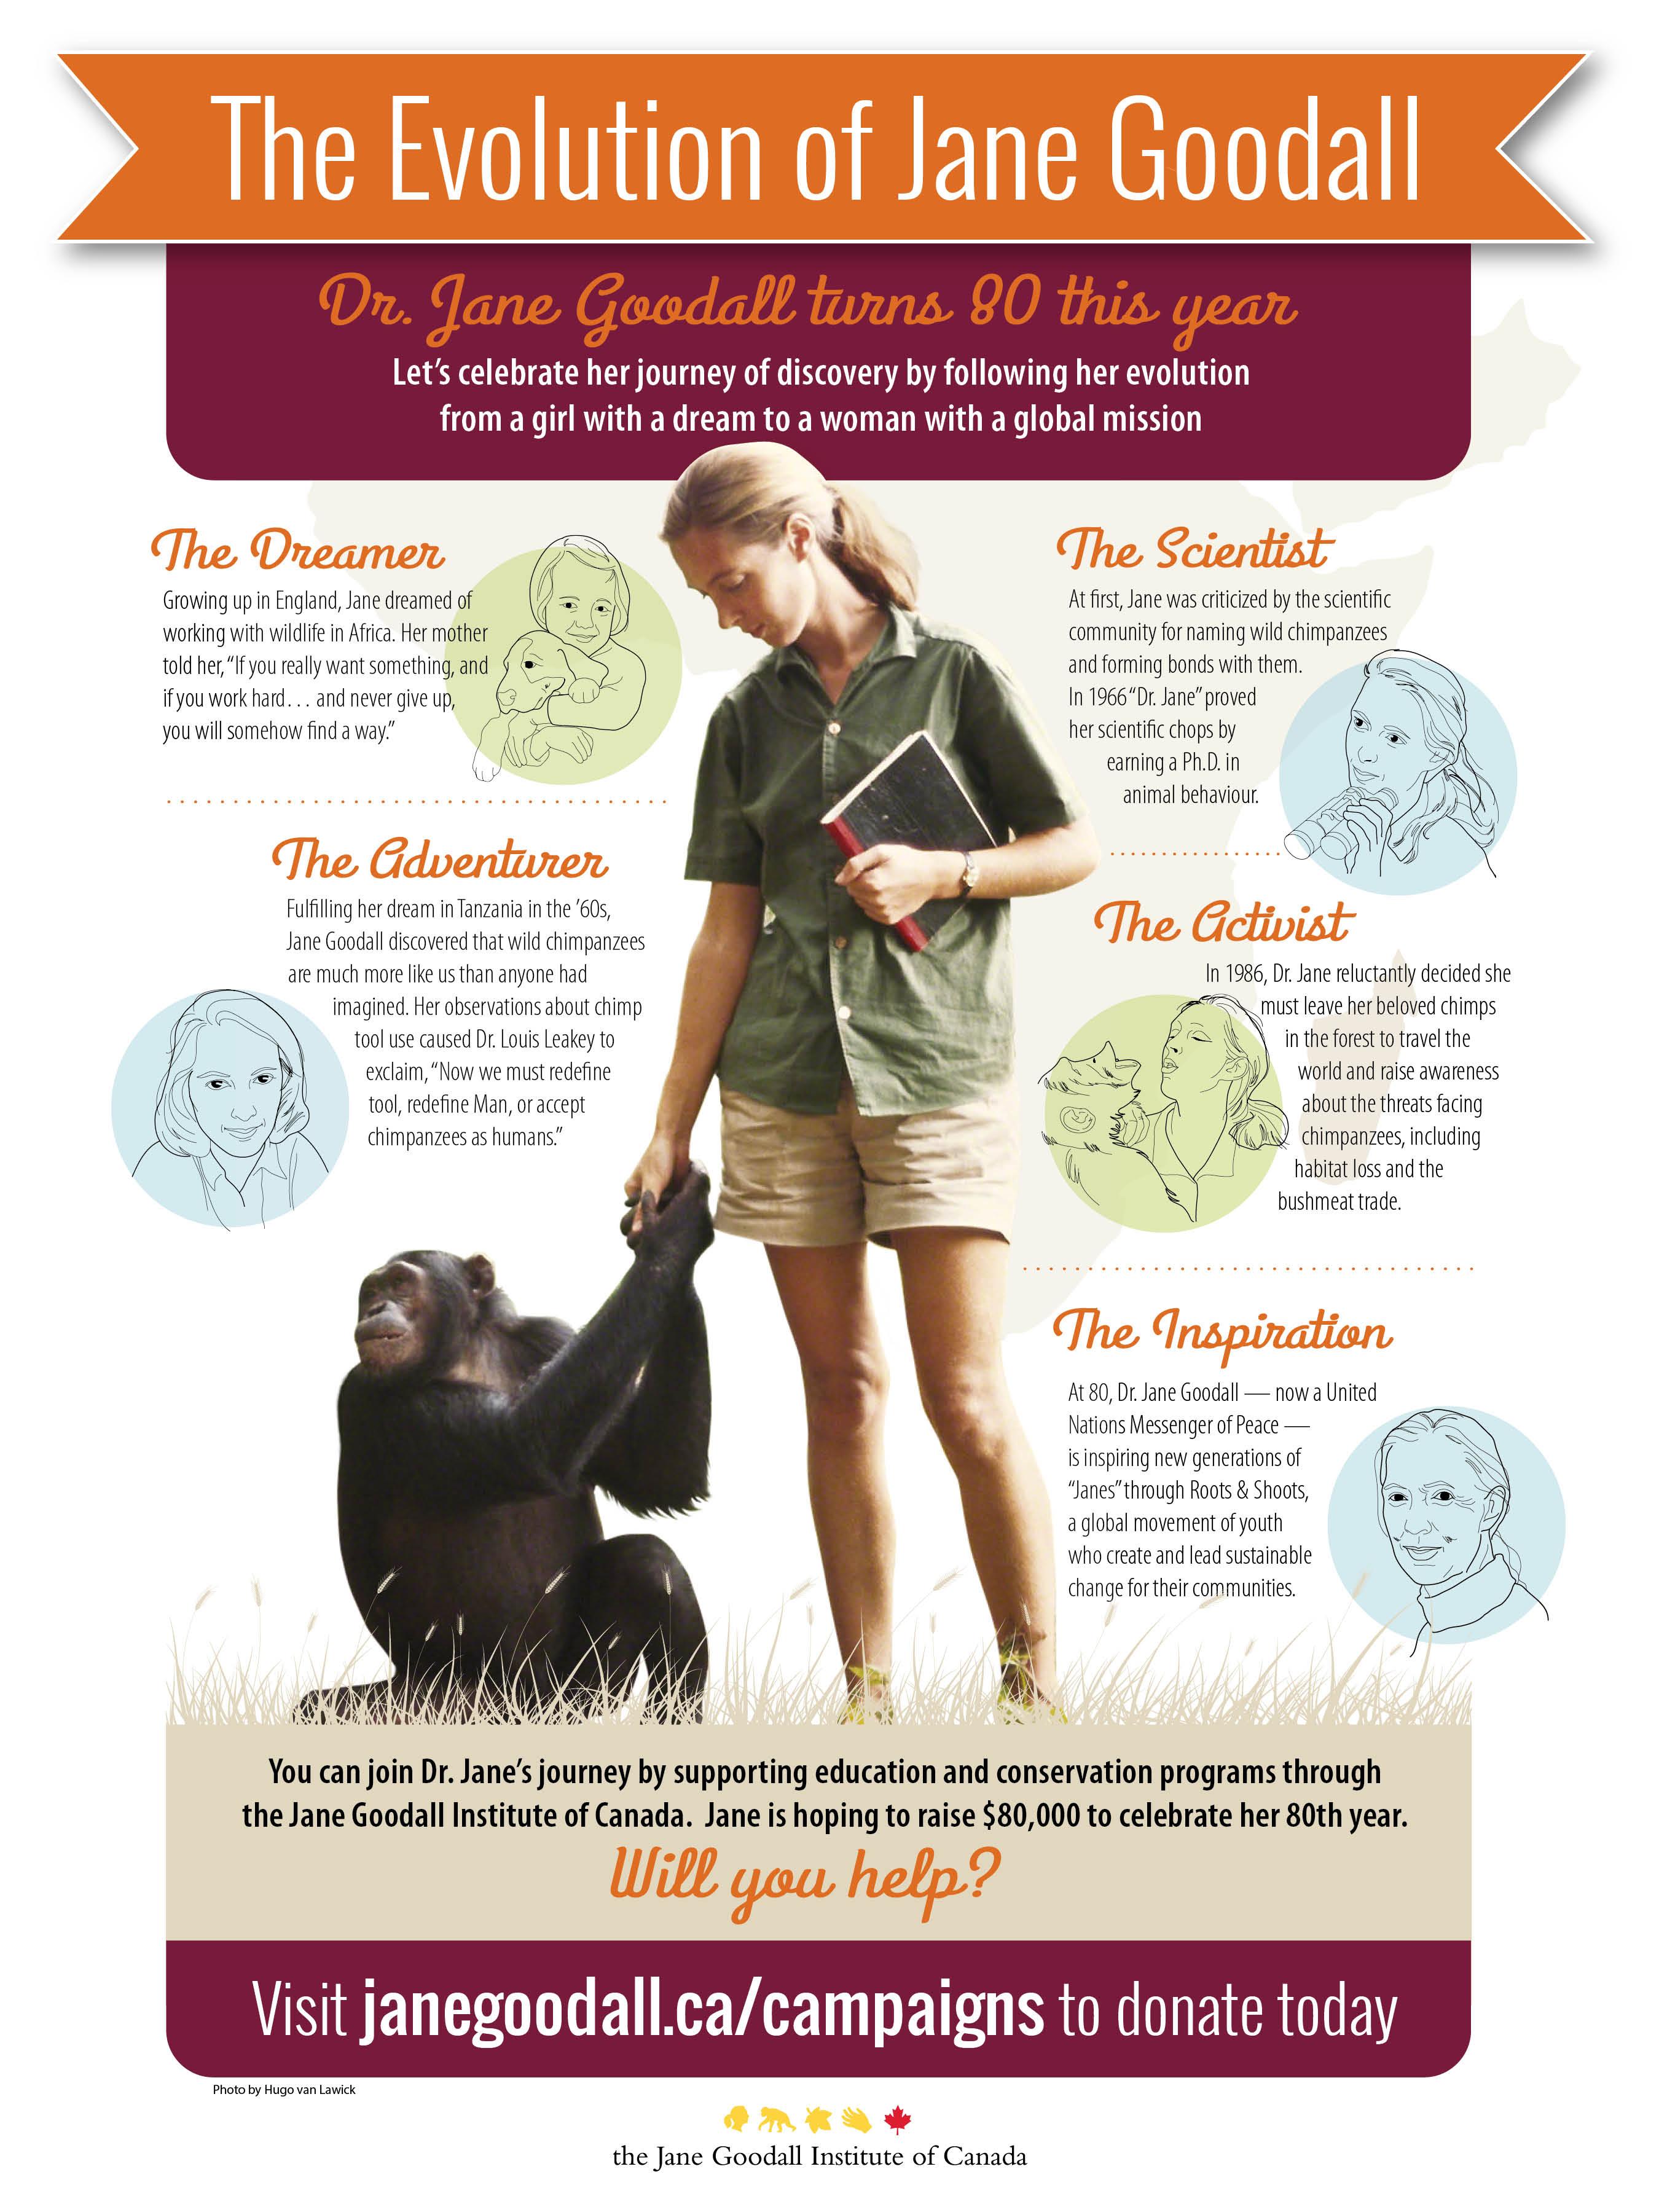 The Evolution of Jane Goodall Biographic